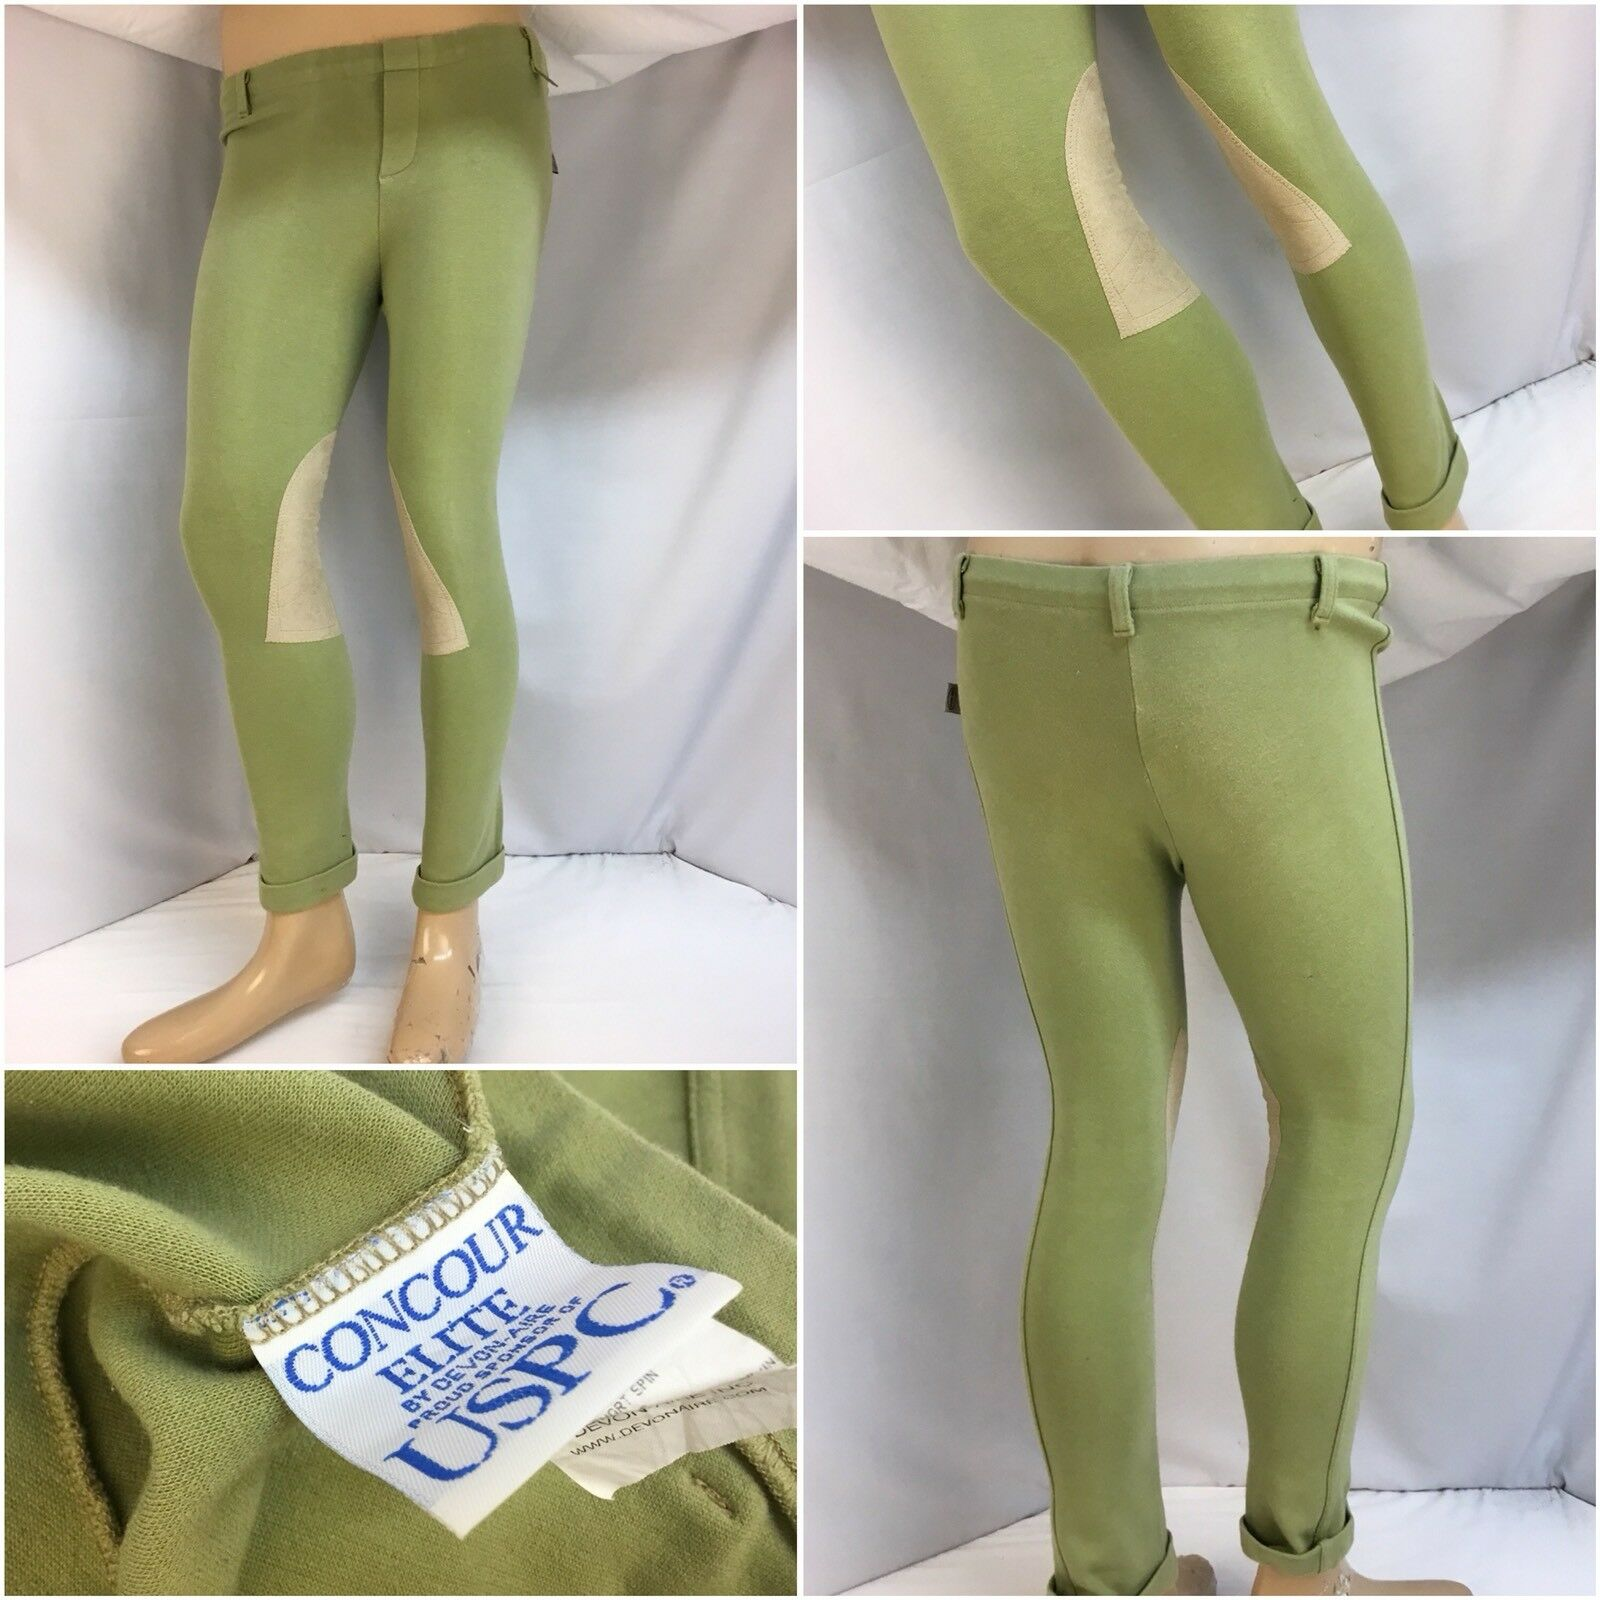 Concour Elite Devon Aire Jodhpurs XL Green Cotton Lycra Riding EUC YGI 9027